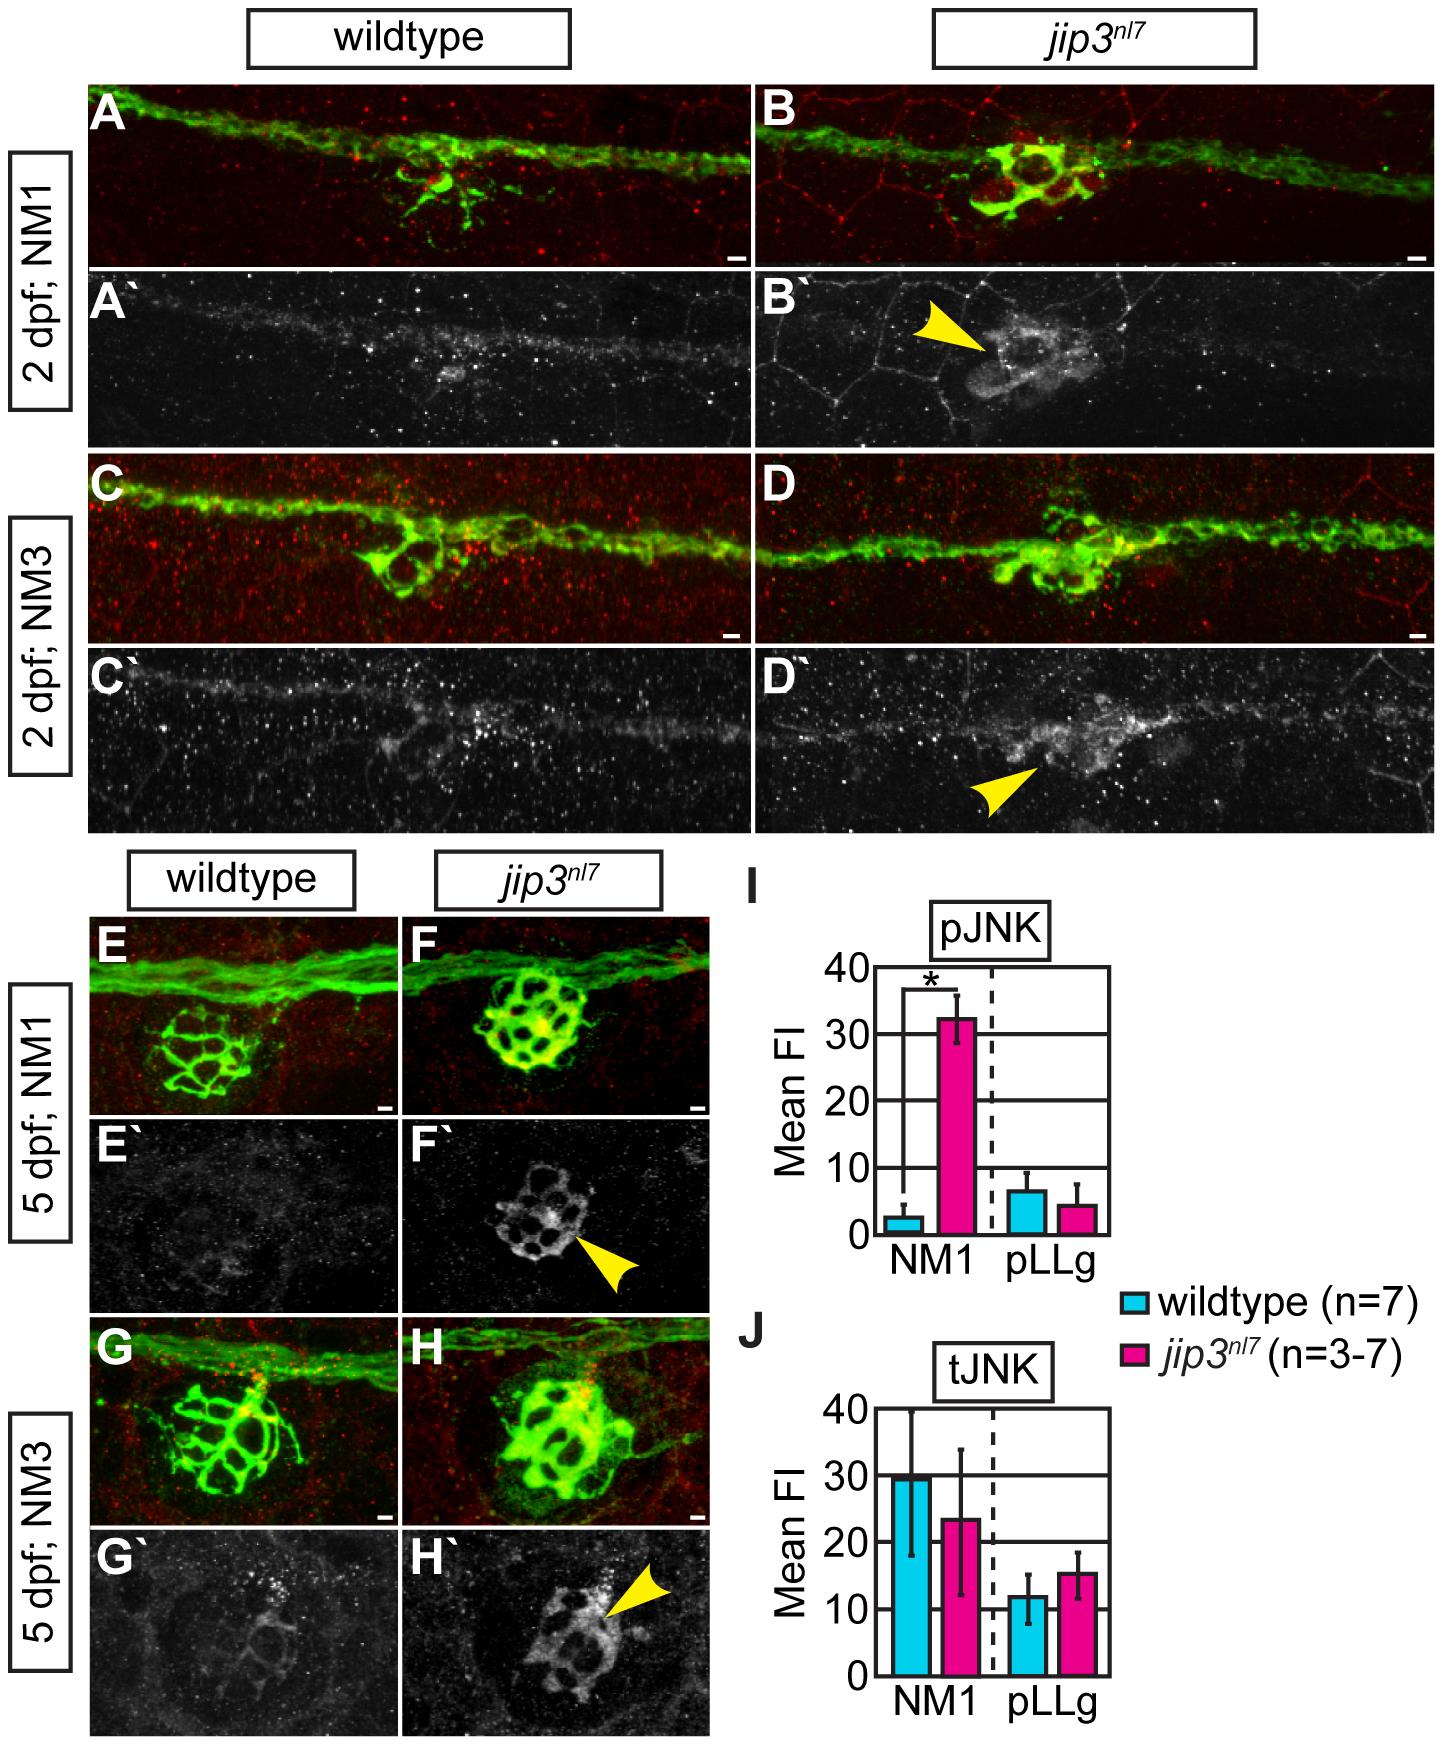 pJNK levels were elevated in <i>jip3<sup>nl7</sup></i> axon terminals.